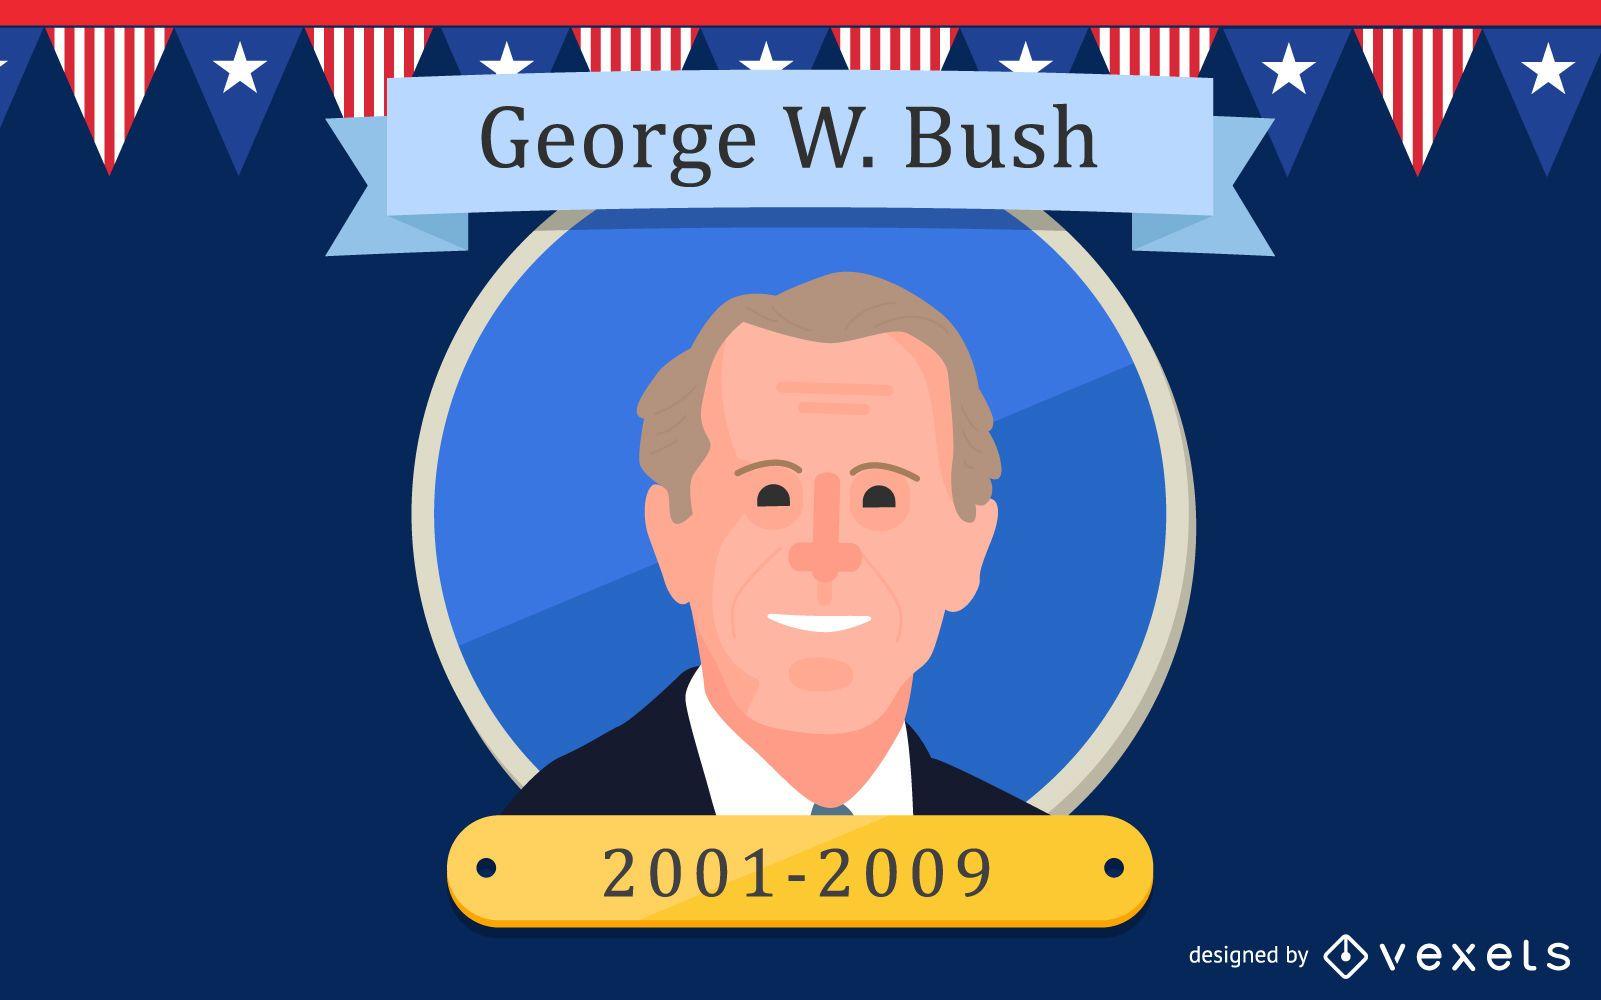 George W. Bush Cartoon Illustration